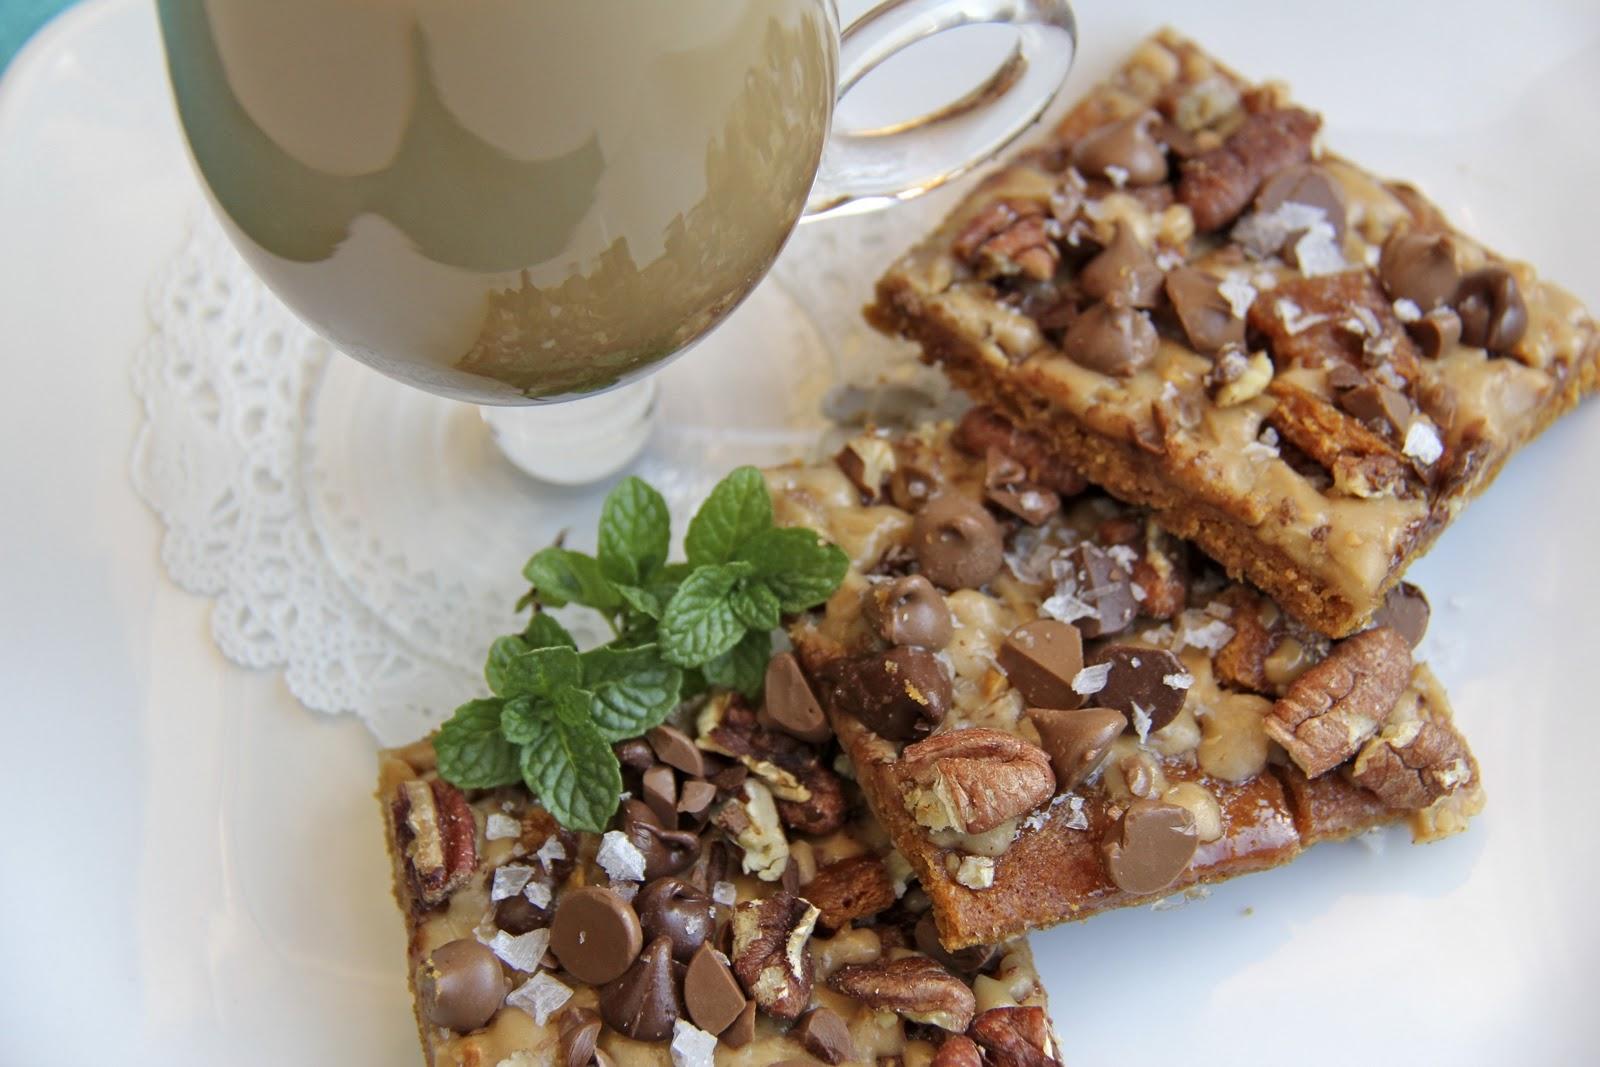 The Café Sucré Farine: Salted Toffee Chocolate Pecan Squares